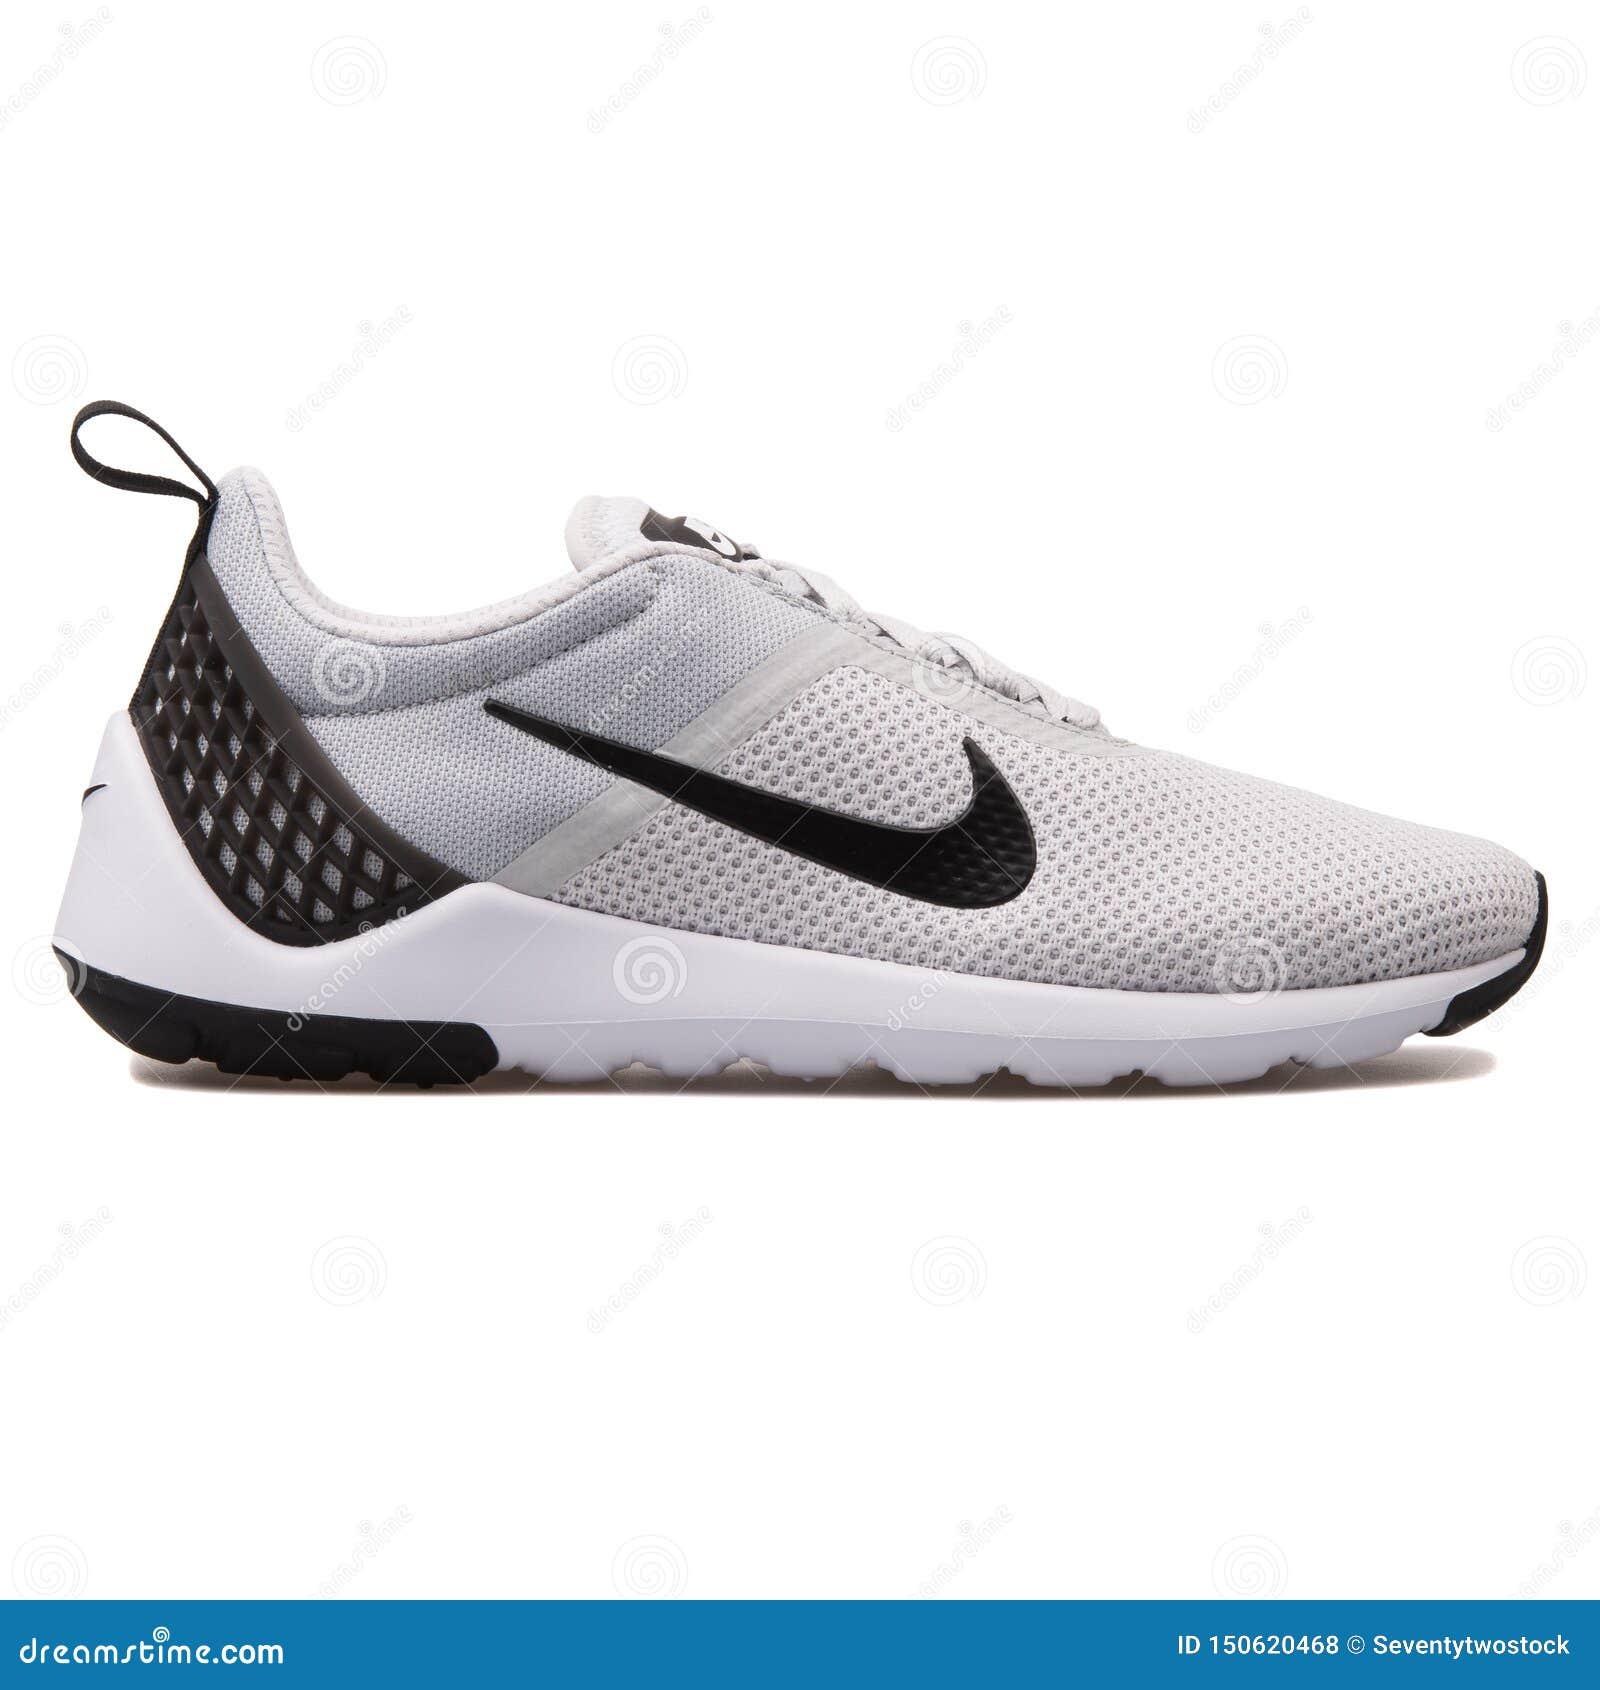 Constitución regimiento admiración  Nike Lunarestoa 2 Essential Platinum, Black And White Sneaker Editorial  Stock Photo - Image of back, nike: 150620468